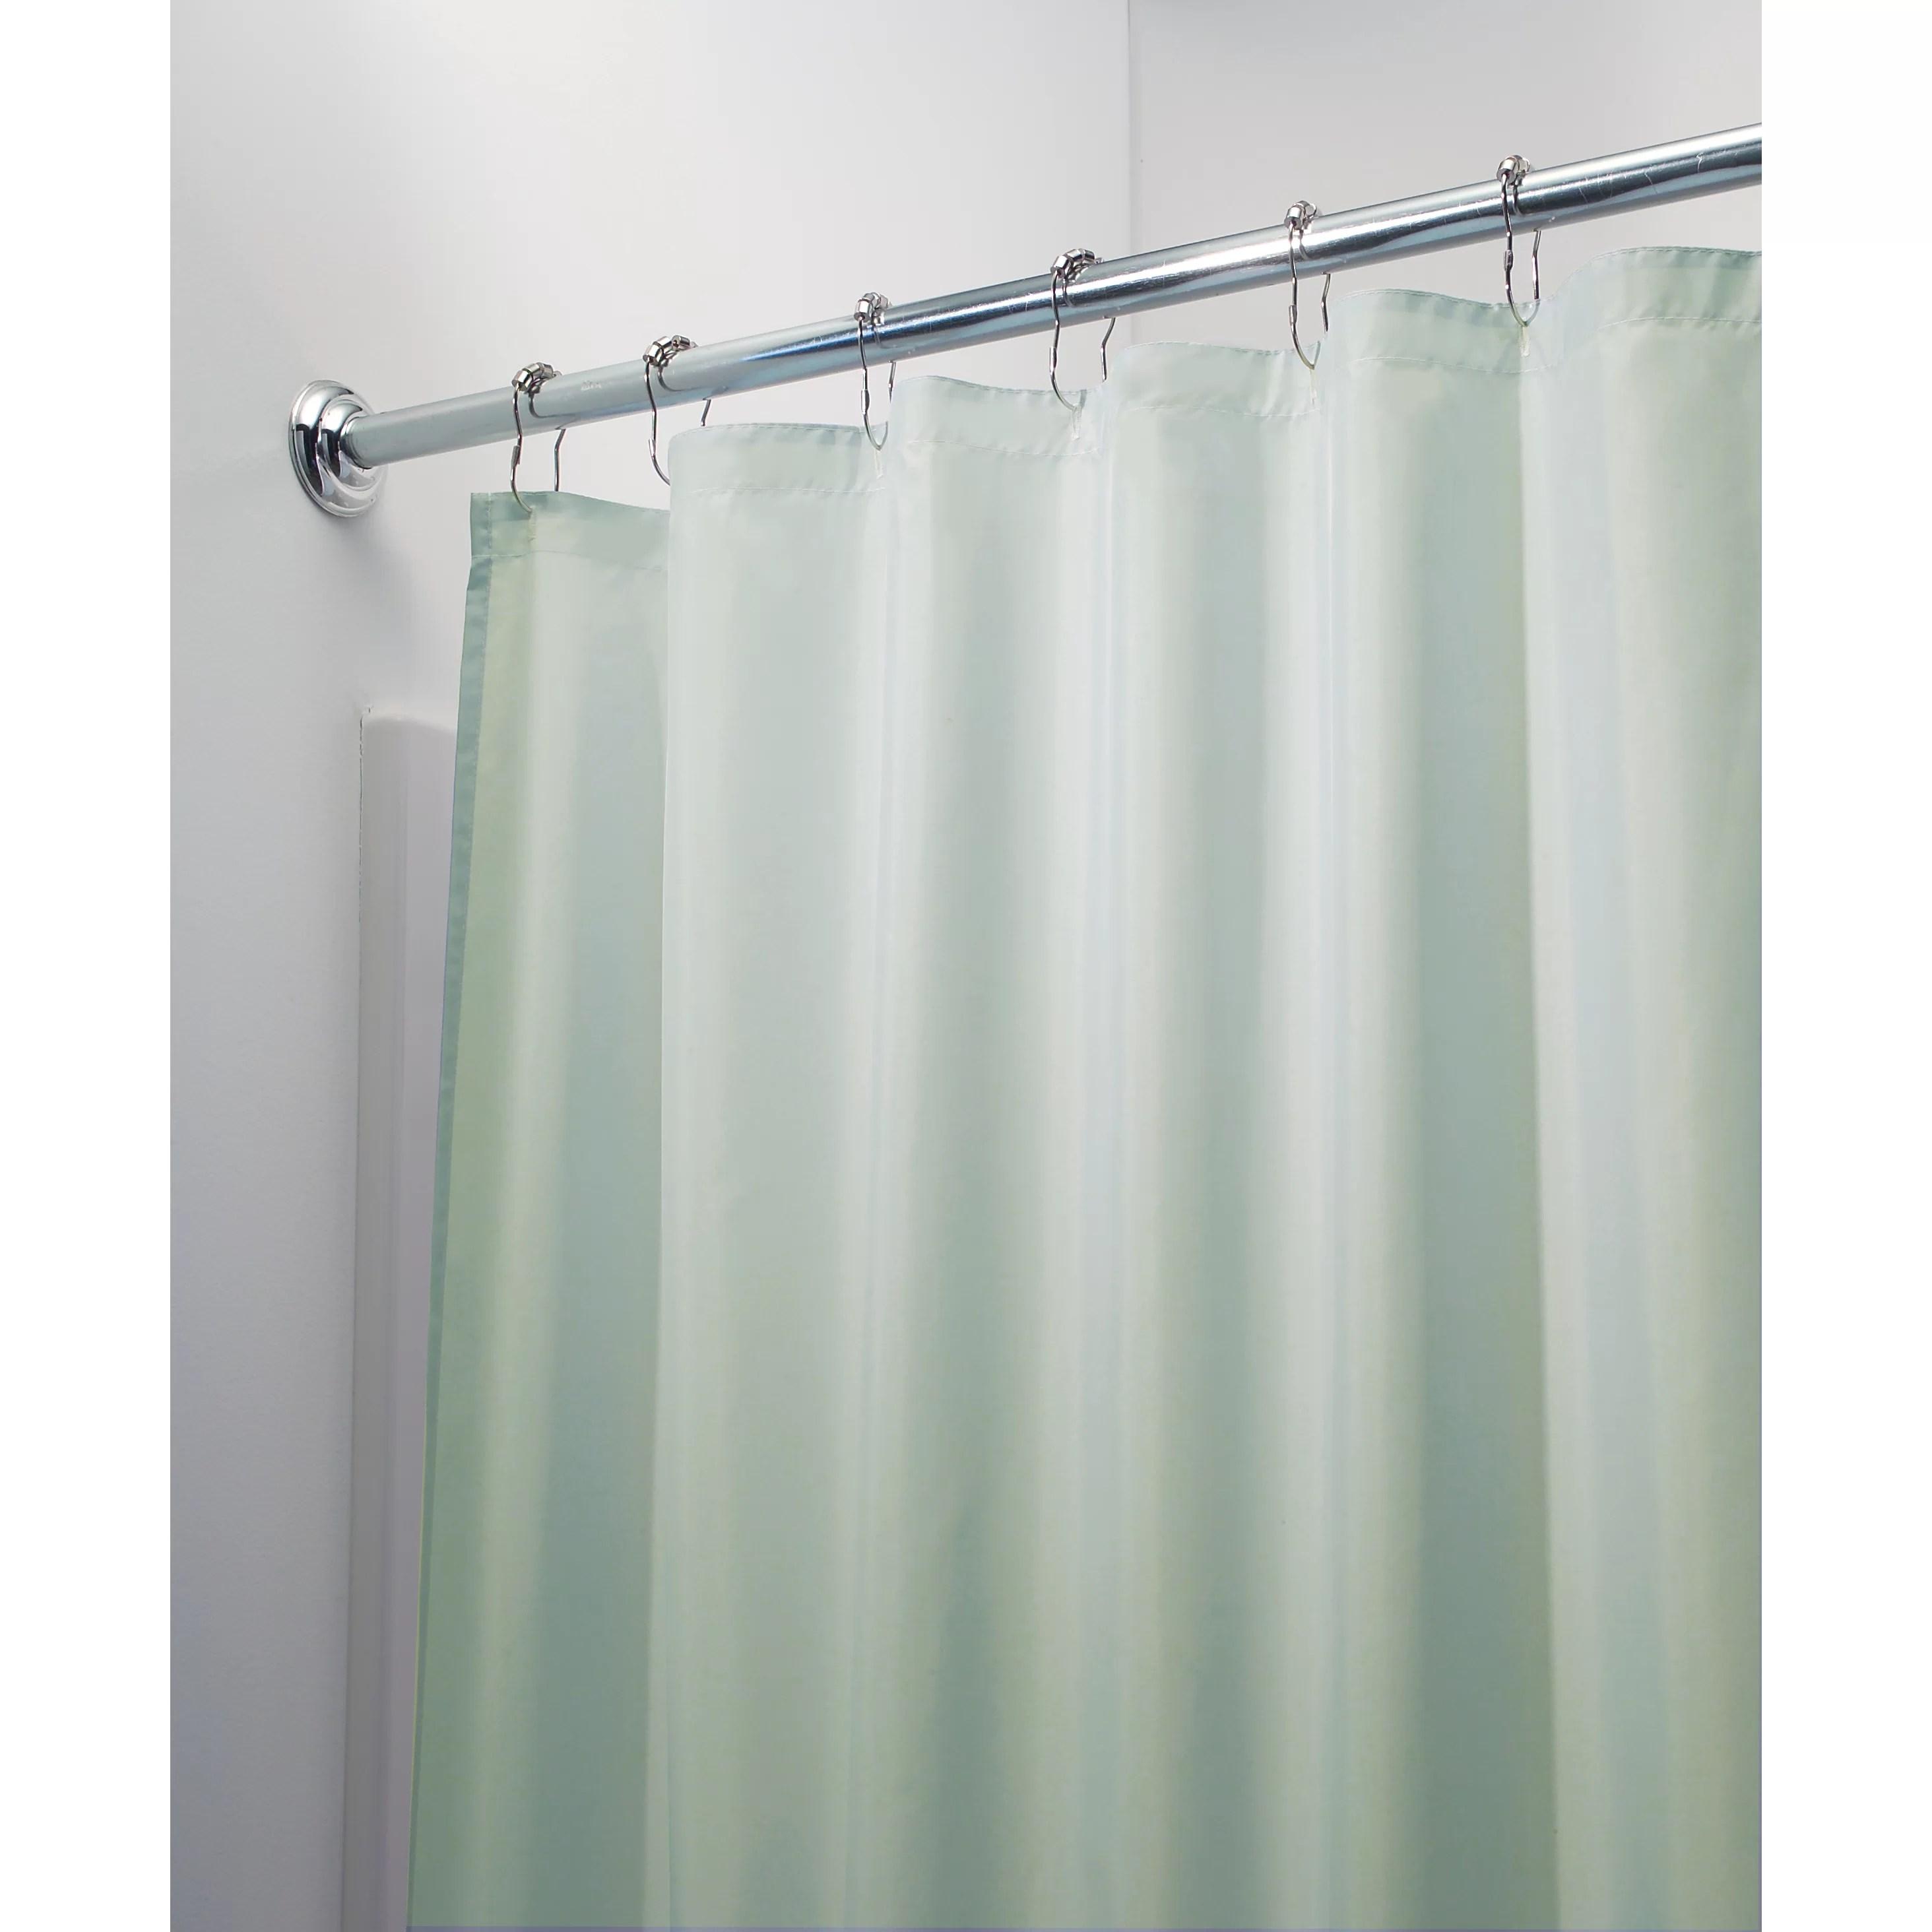 Symple Stuff Waterproof Shower Curtain Liner  Reviews